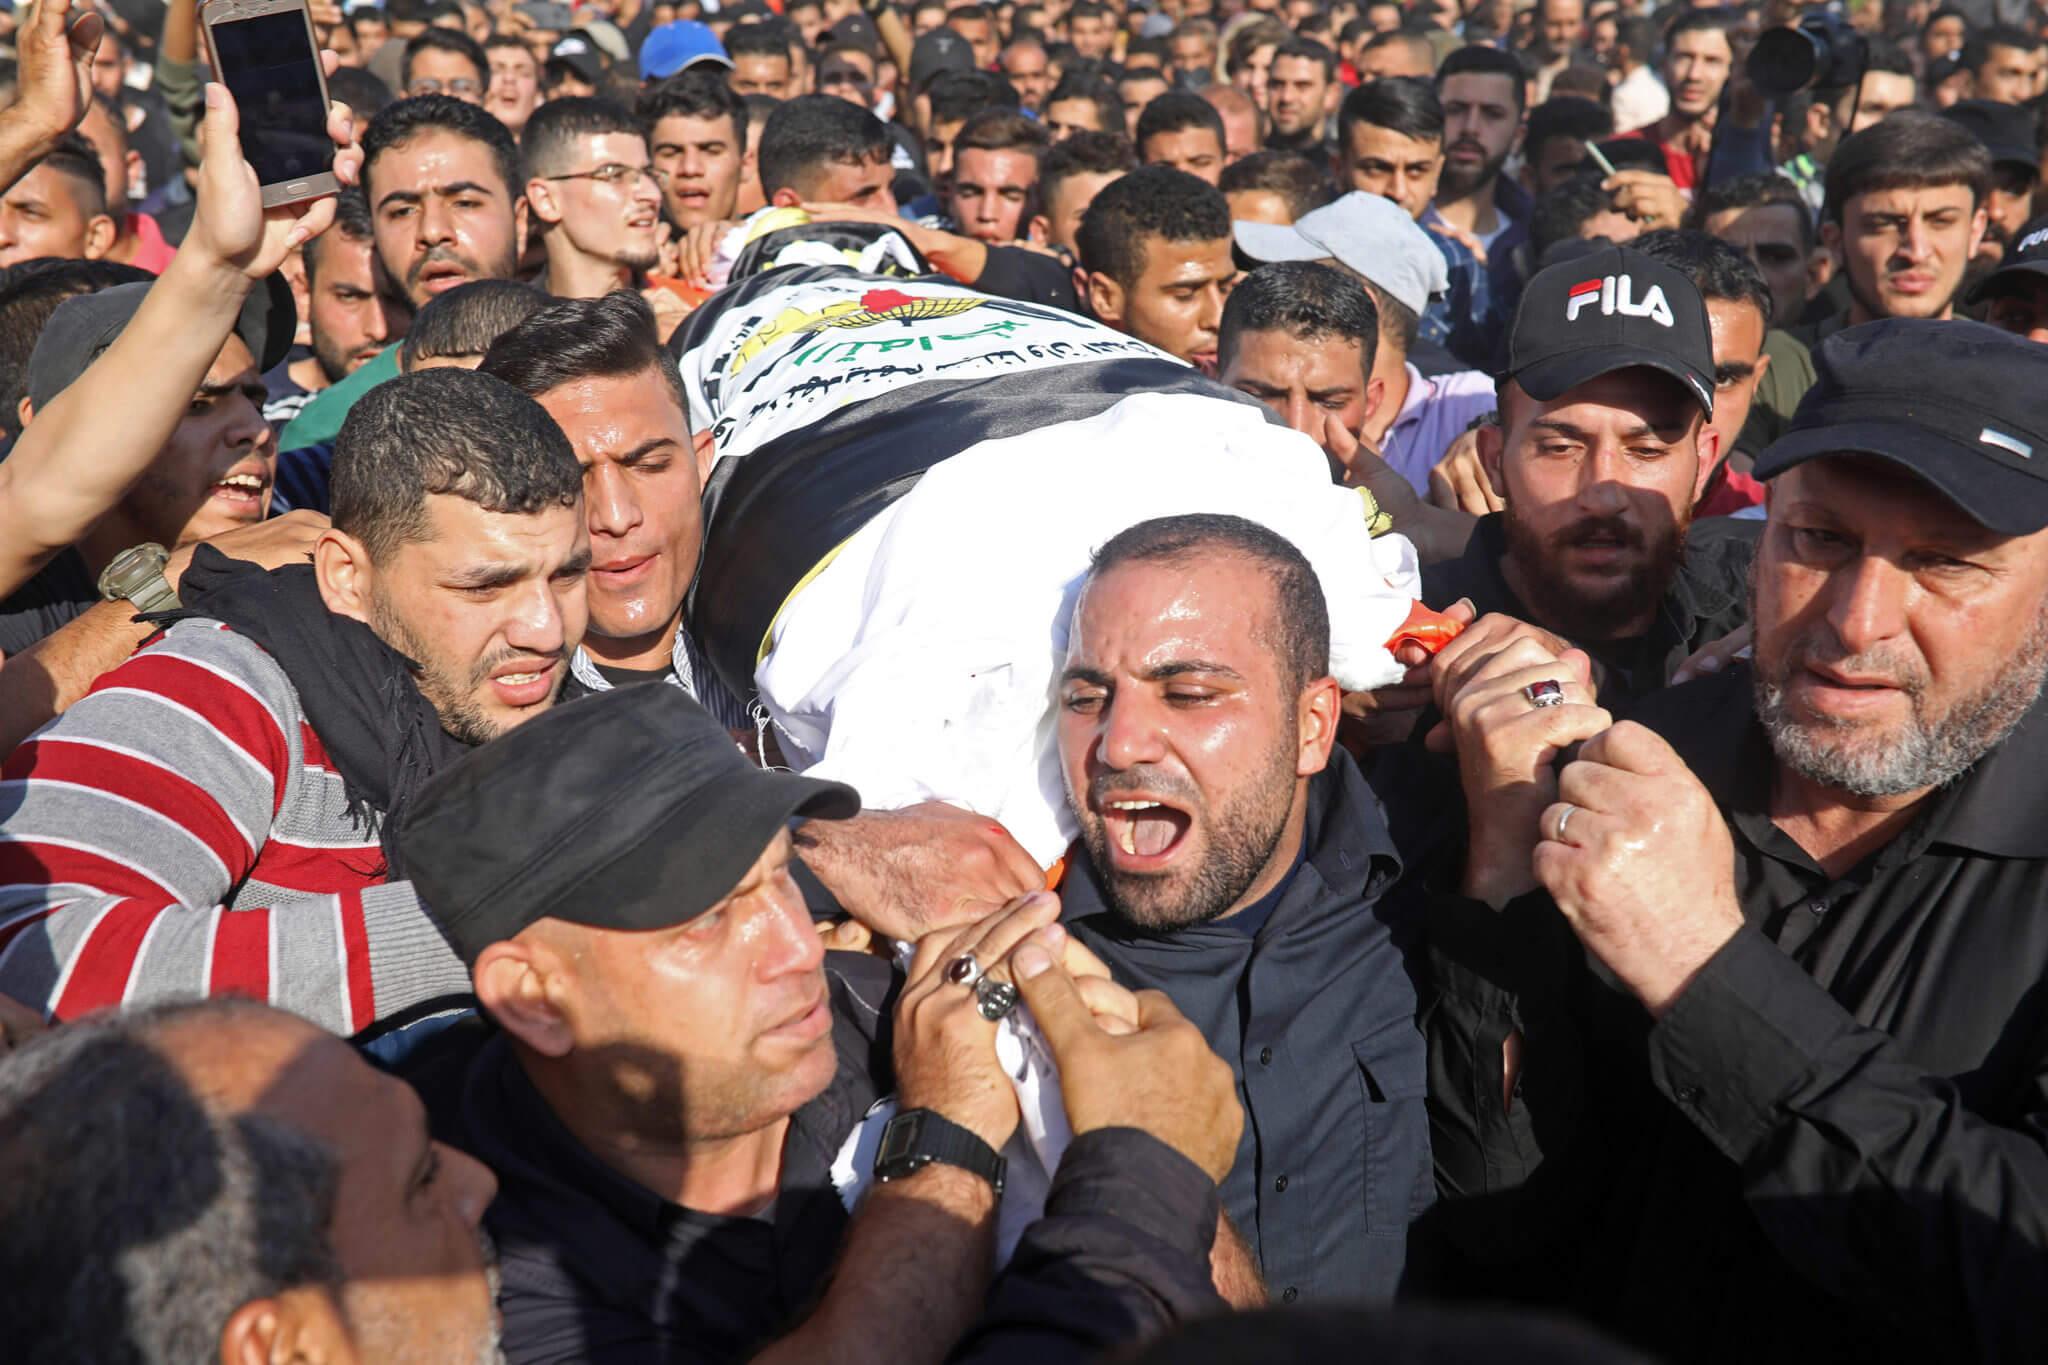 Mourners carry the body of Palestinian Islamic Jihad leader Baha Abu Al-Att a during his funeral in Gaza City, on November 12, 2019.(Photo: byMohammed Zaanoun/Activestills.org)